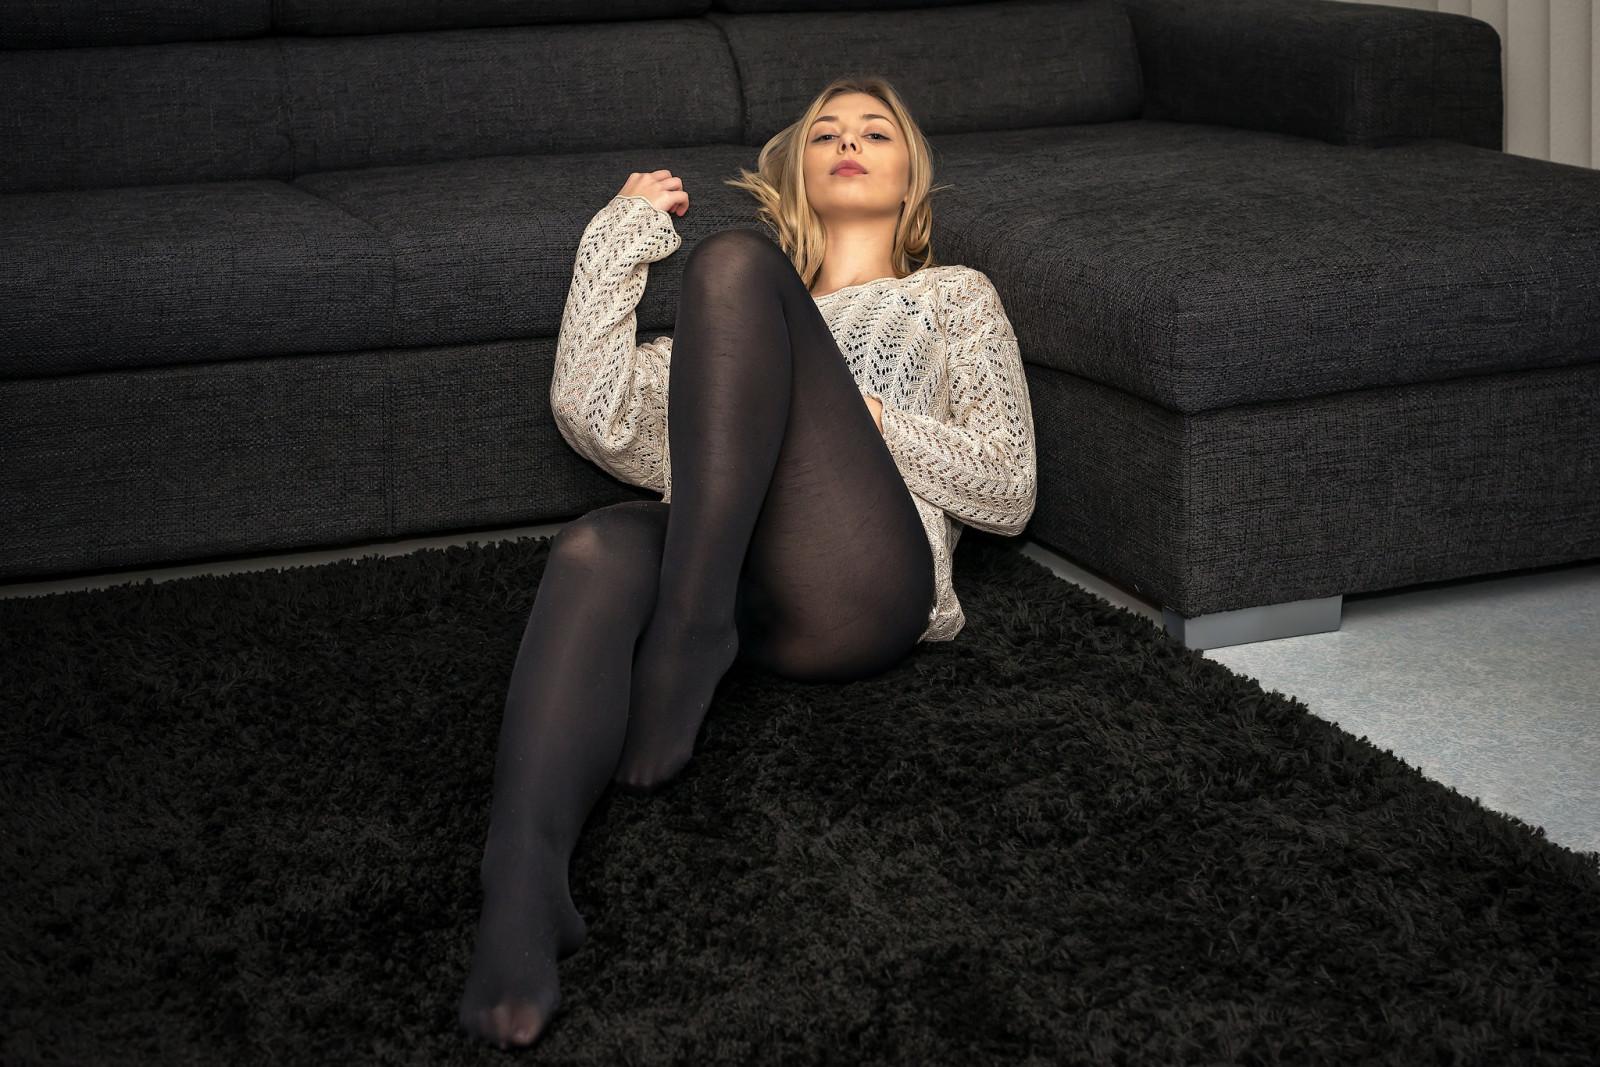 Wallpaper : women, on the floor, legs, pantyhose, blonde